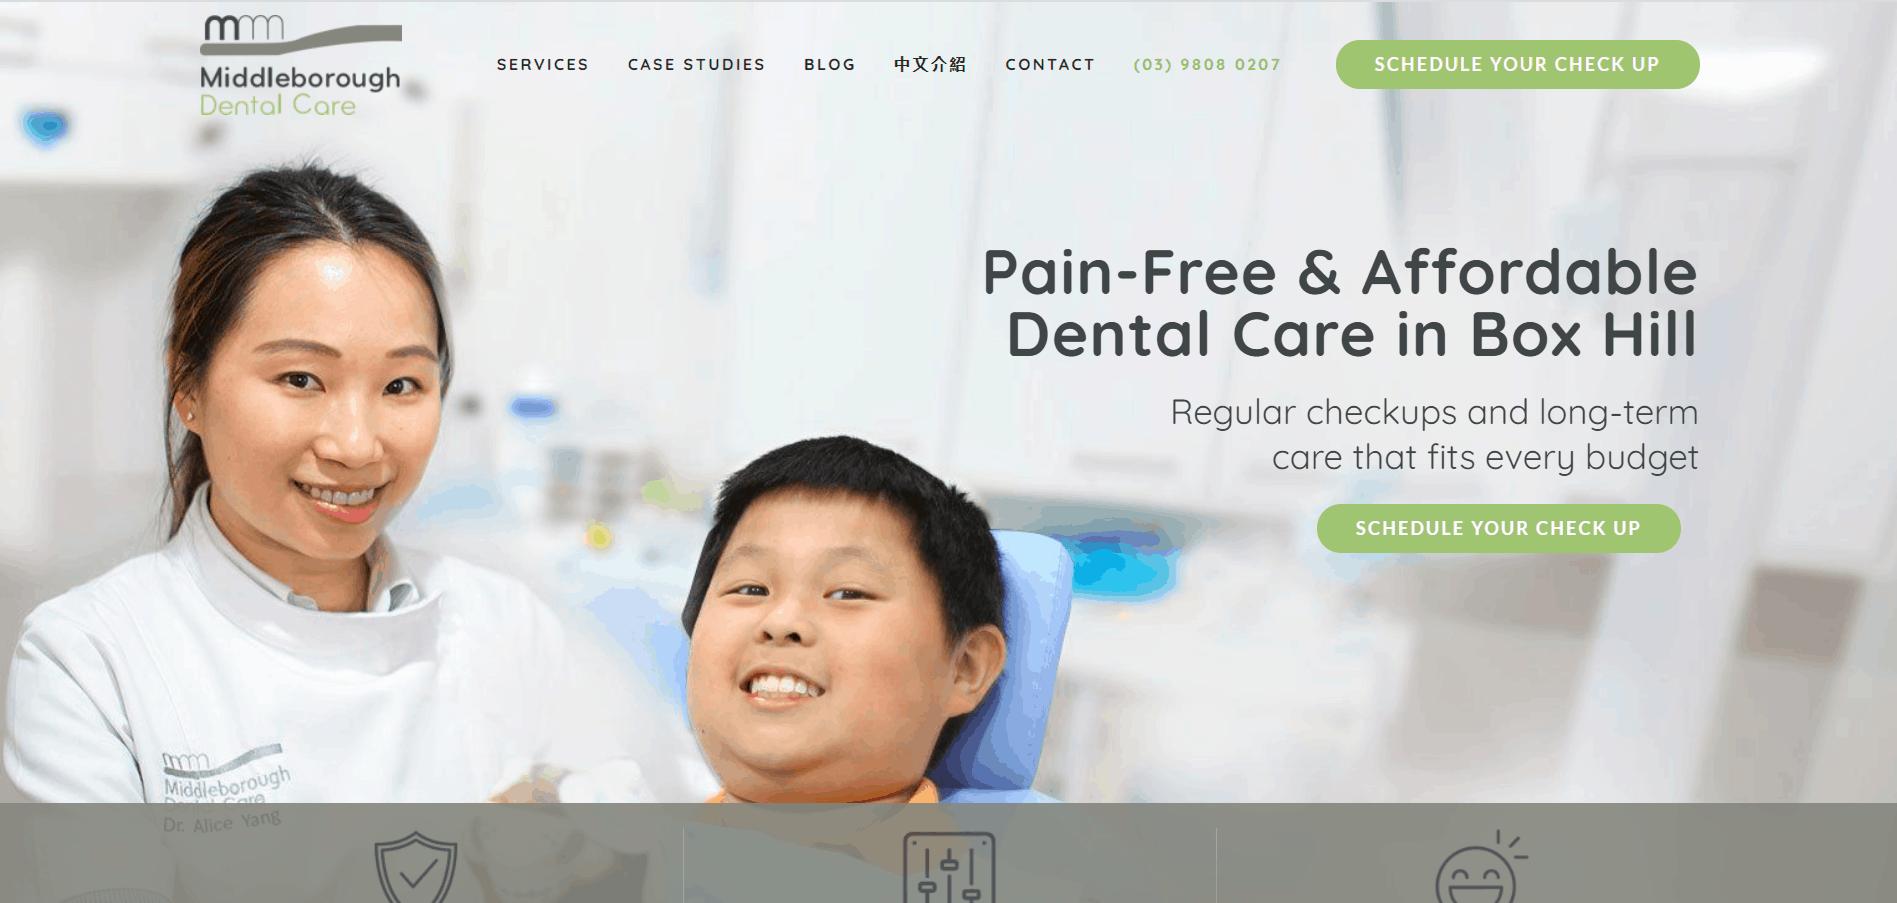 Middleborough Dental Care